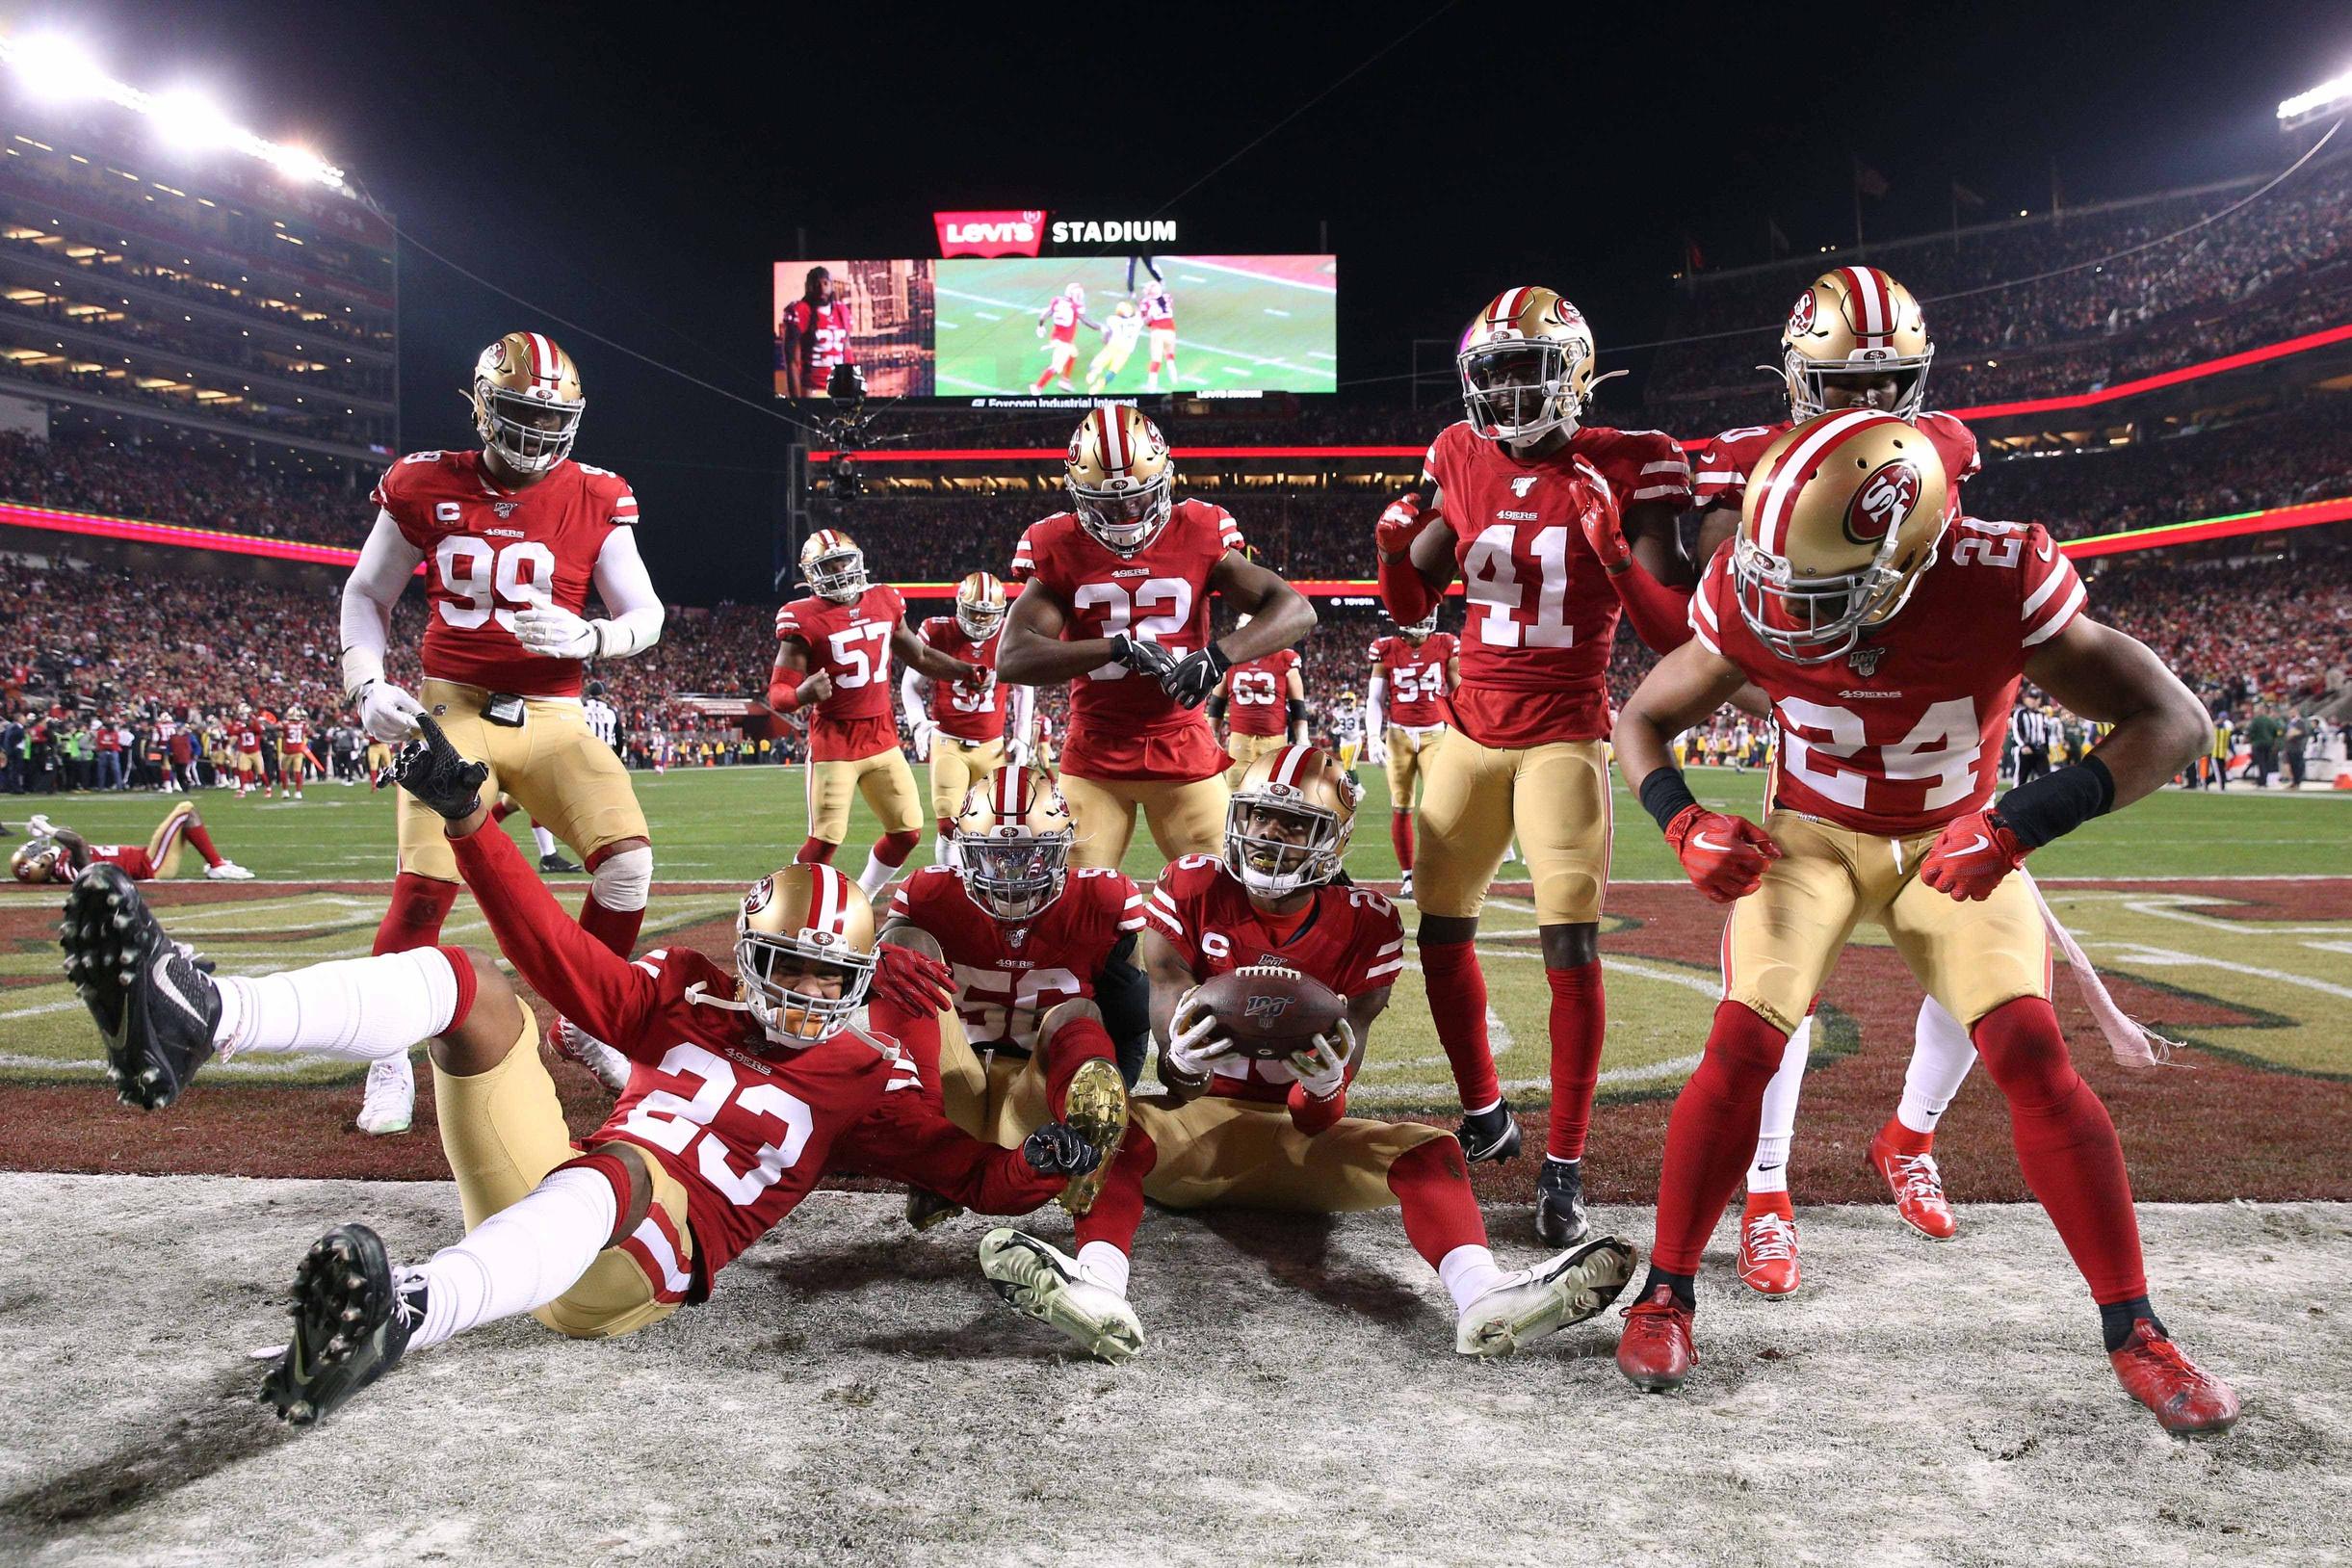 Nfl Best Defenses 2021 5 best defenses entering 2020 NFL season